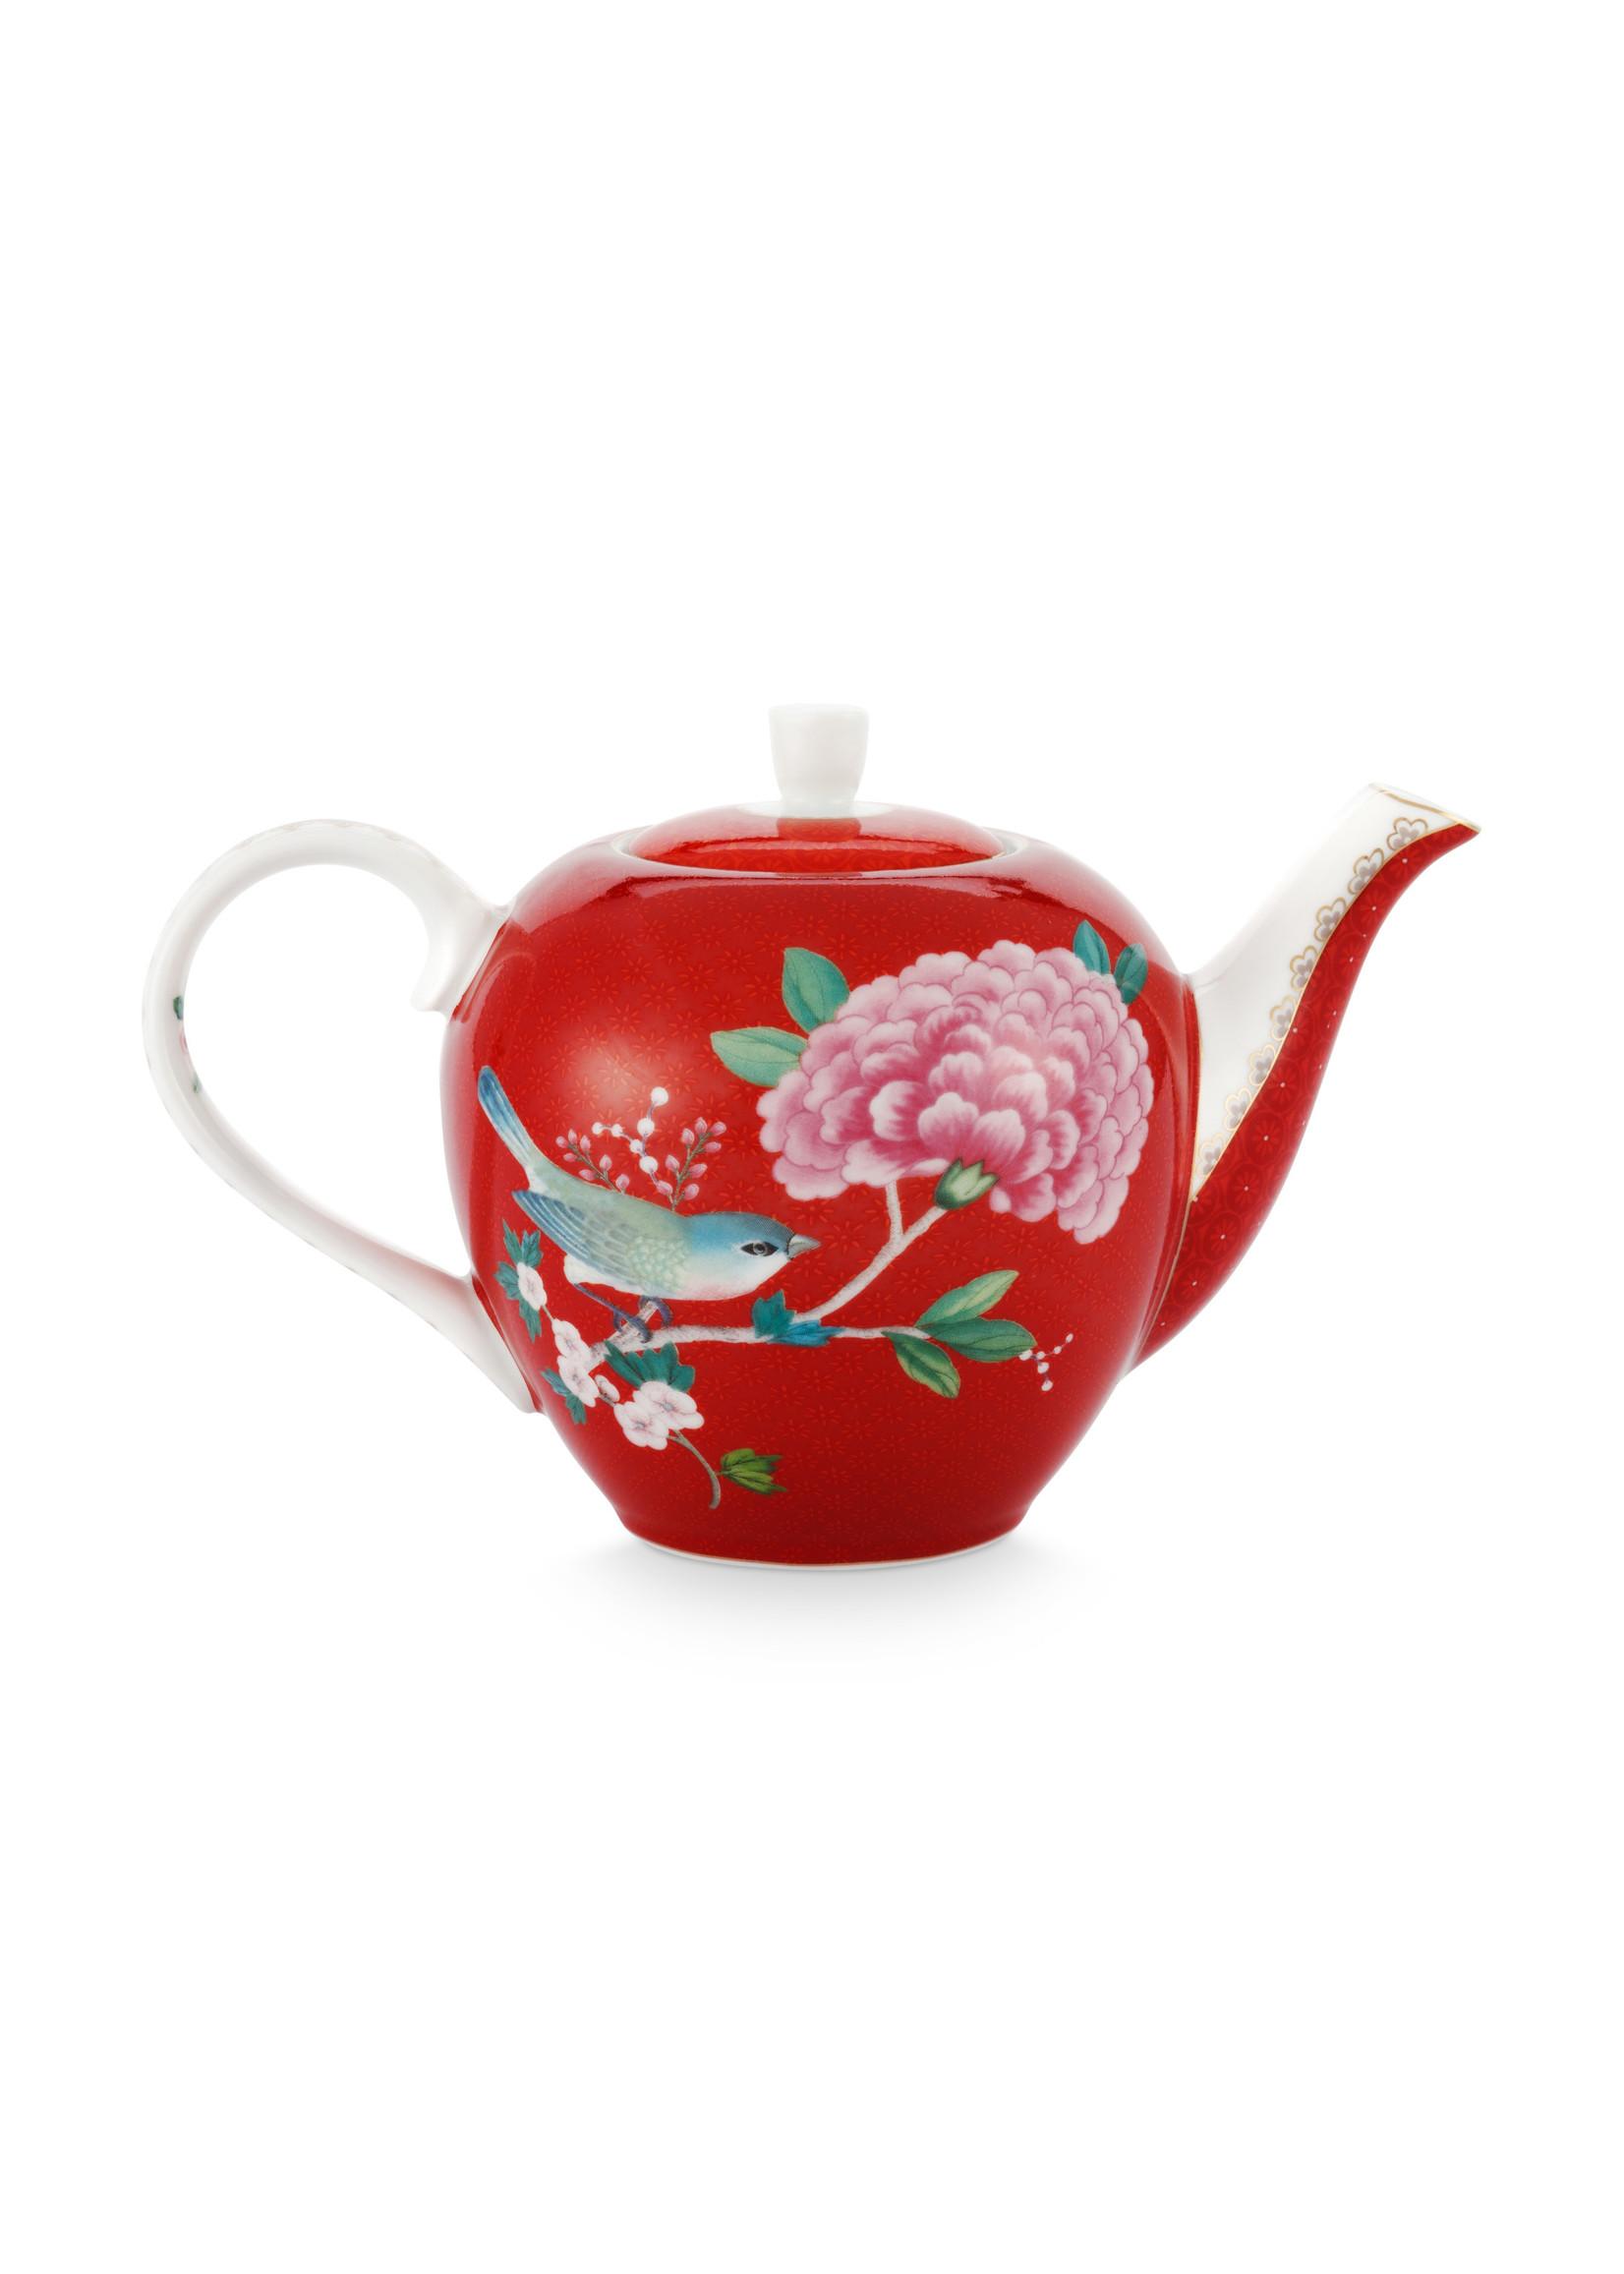 pip studio Tea Pot Small Blushing Birds Red 750ml